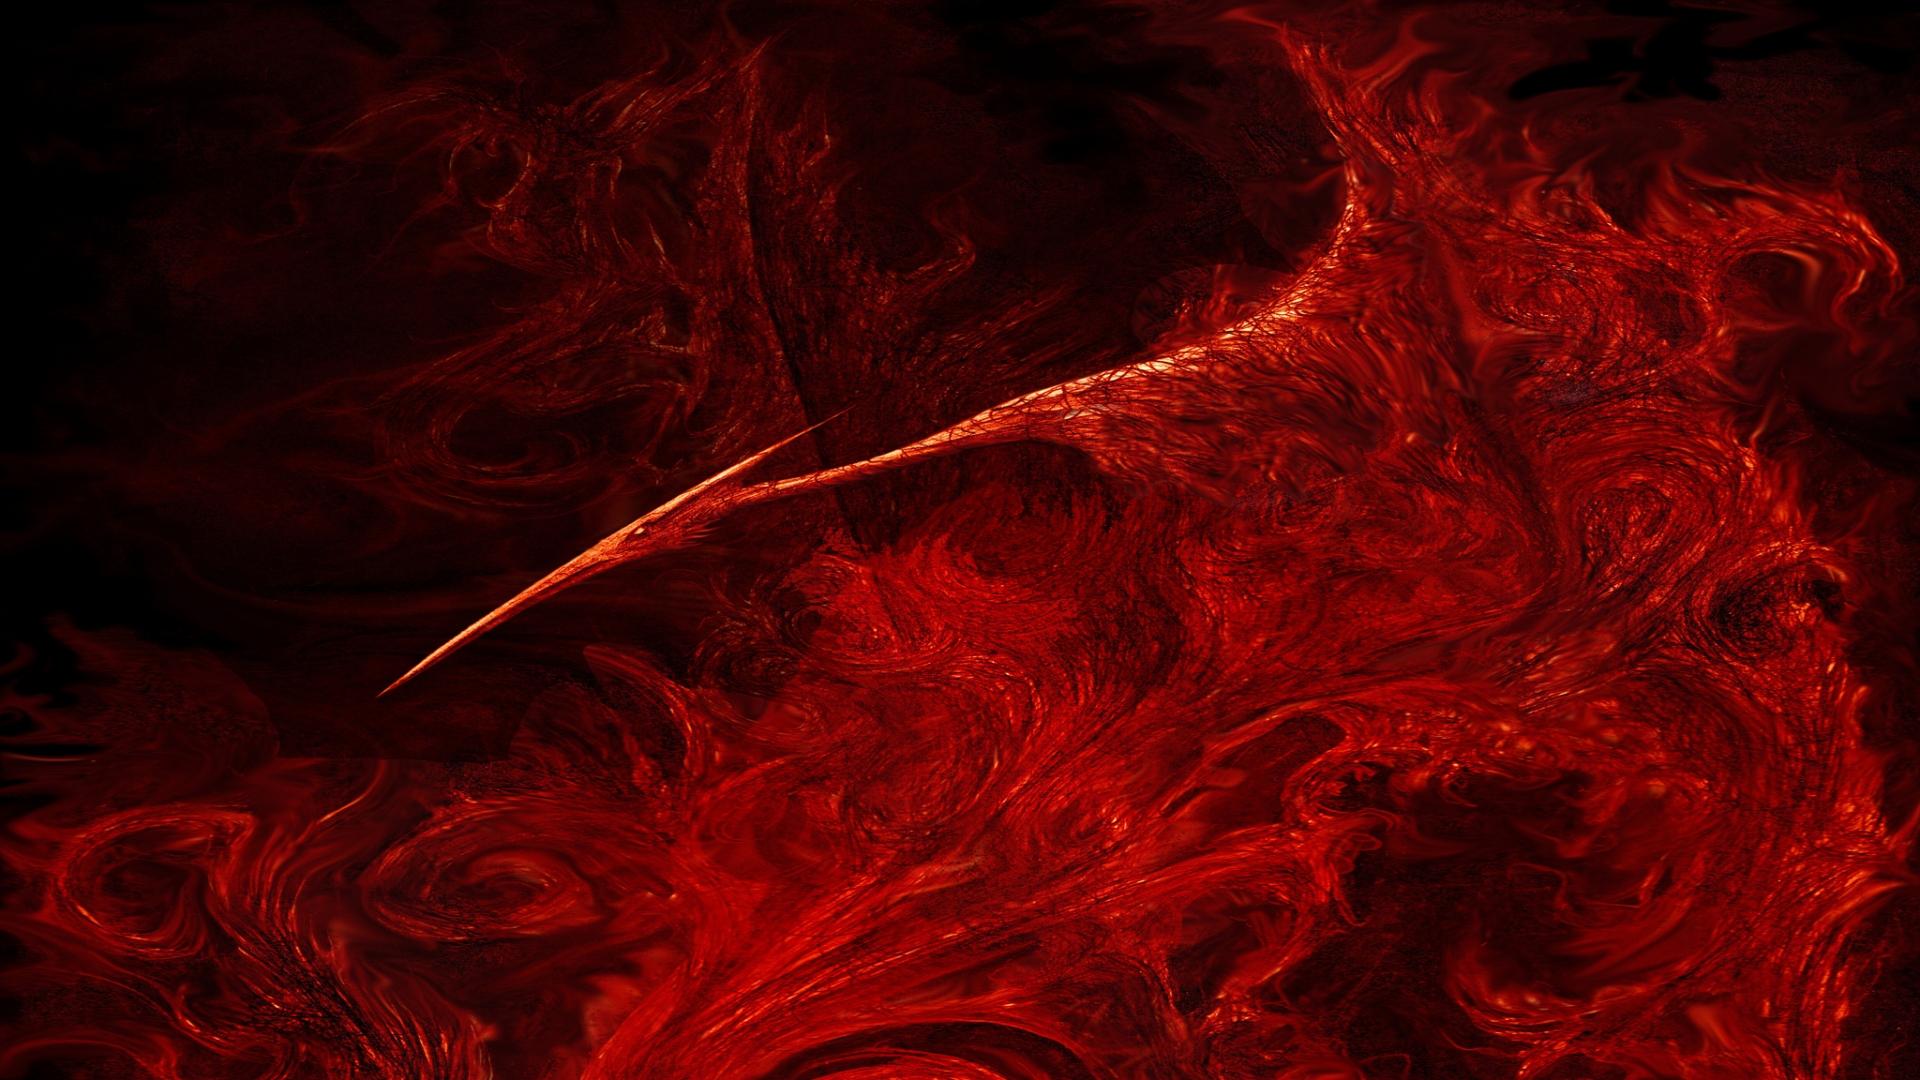 phoenix iphone wallpaper - photo #42